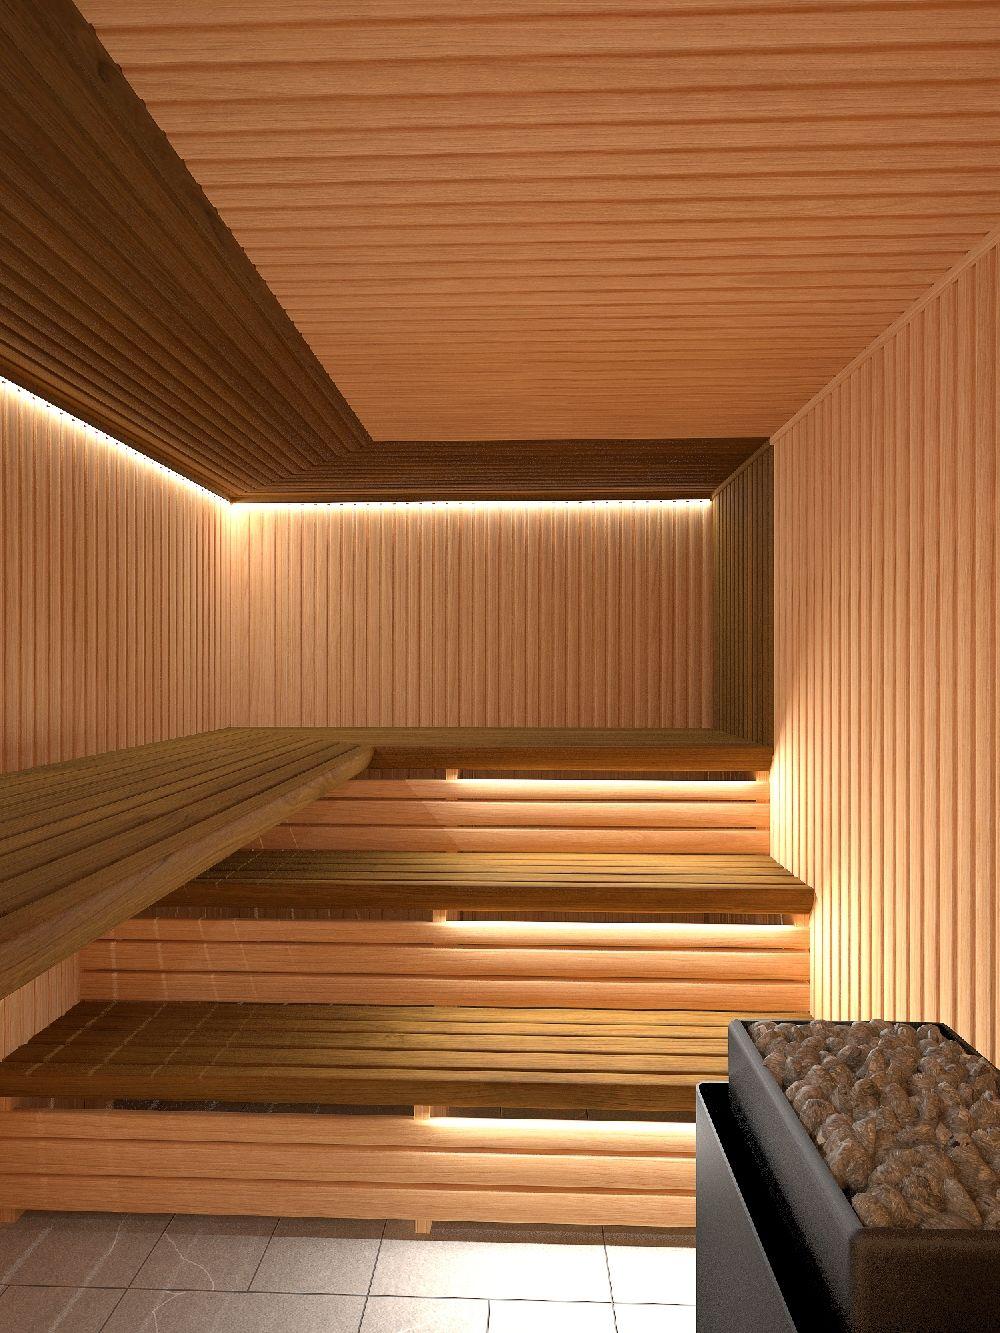 Sauna Project By Artom Bugo At Coroflot Com Spa Dizajn Domiki Krasivye Vannye Komnaty